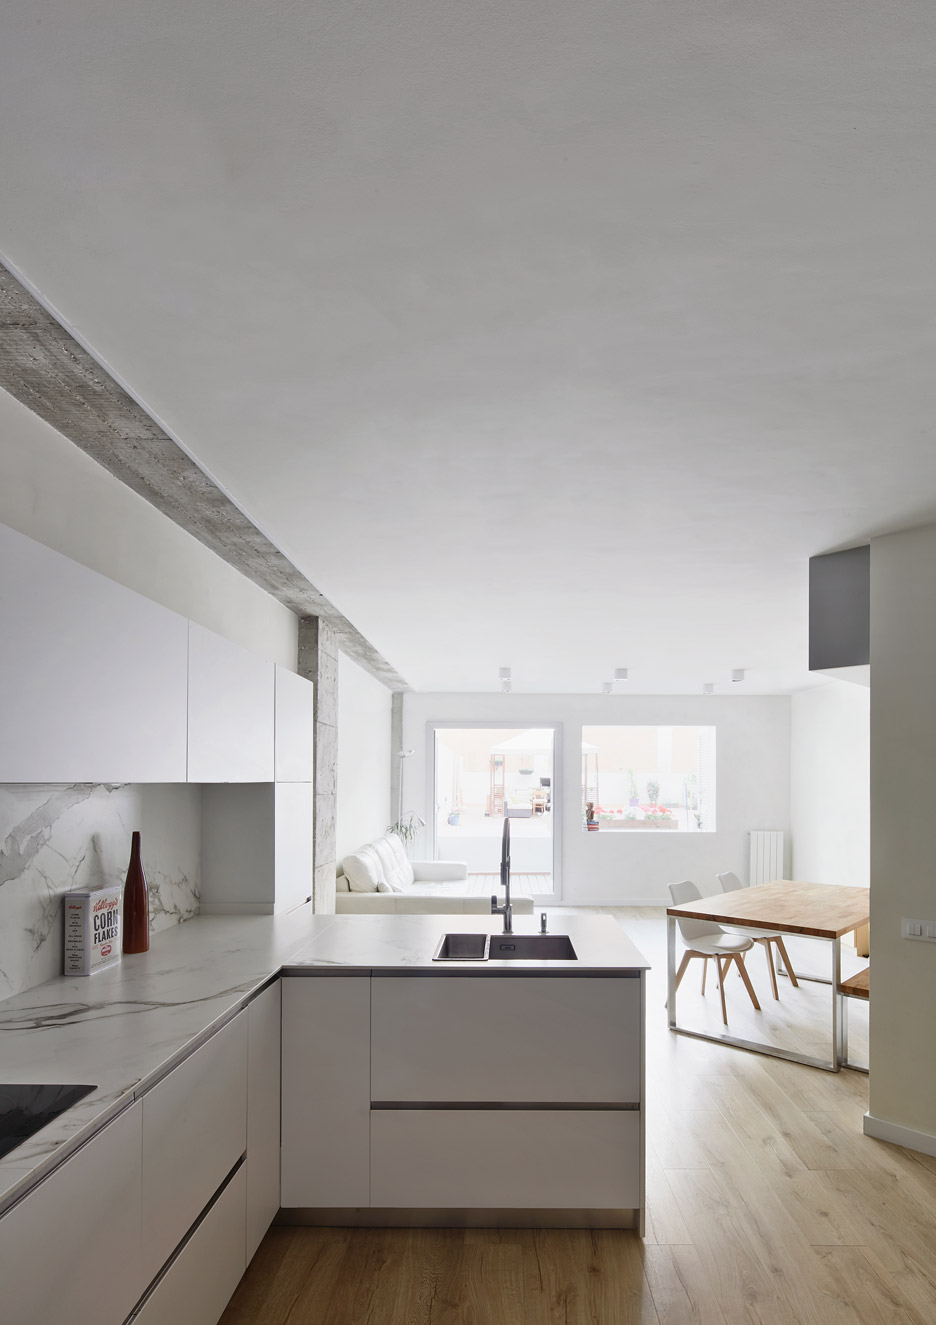 architecture_ open_layout__design_studia_interiors_osnovadesign_osnova_poltava_05